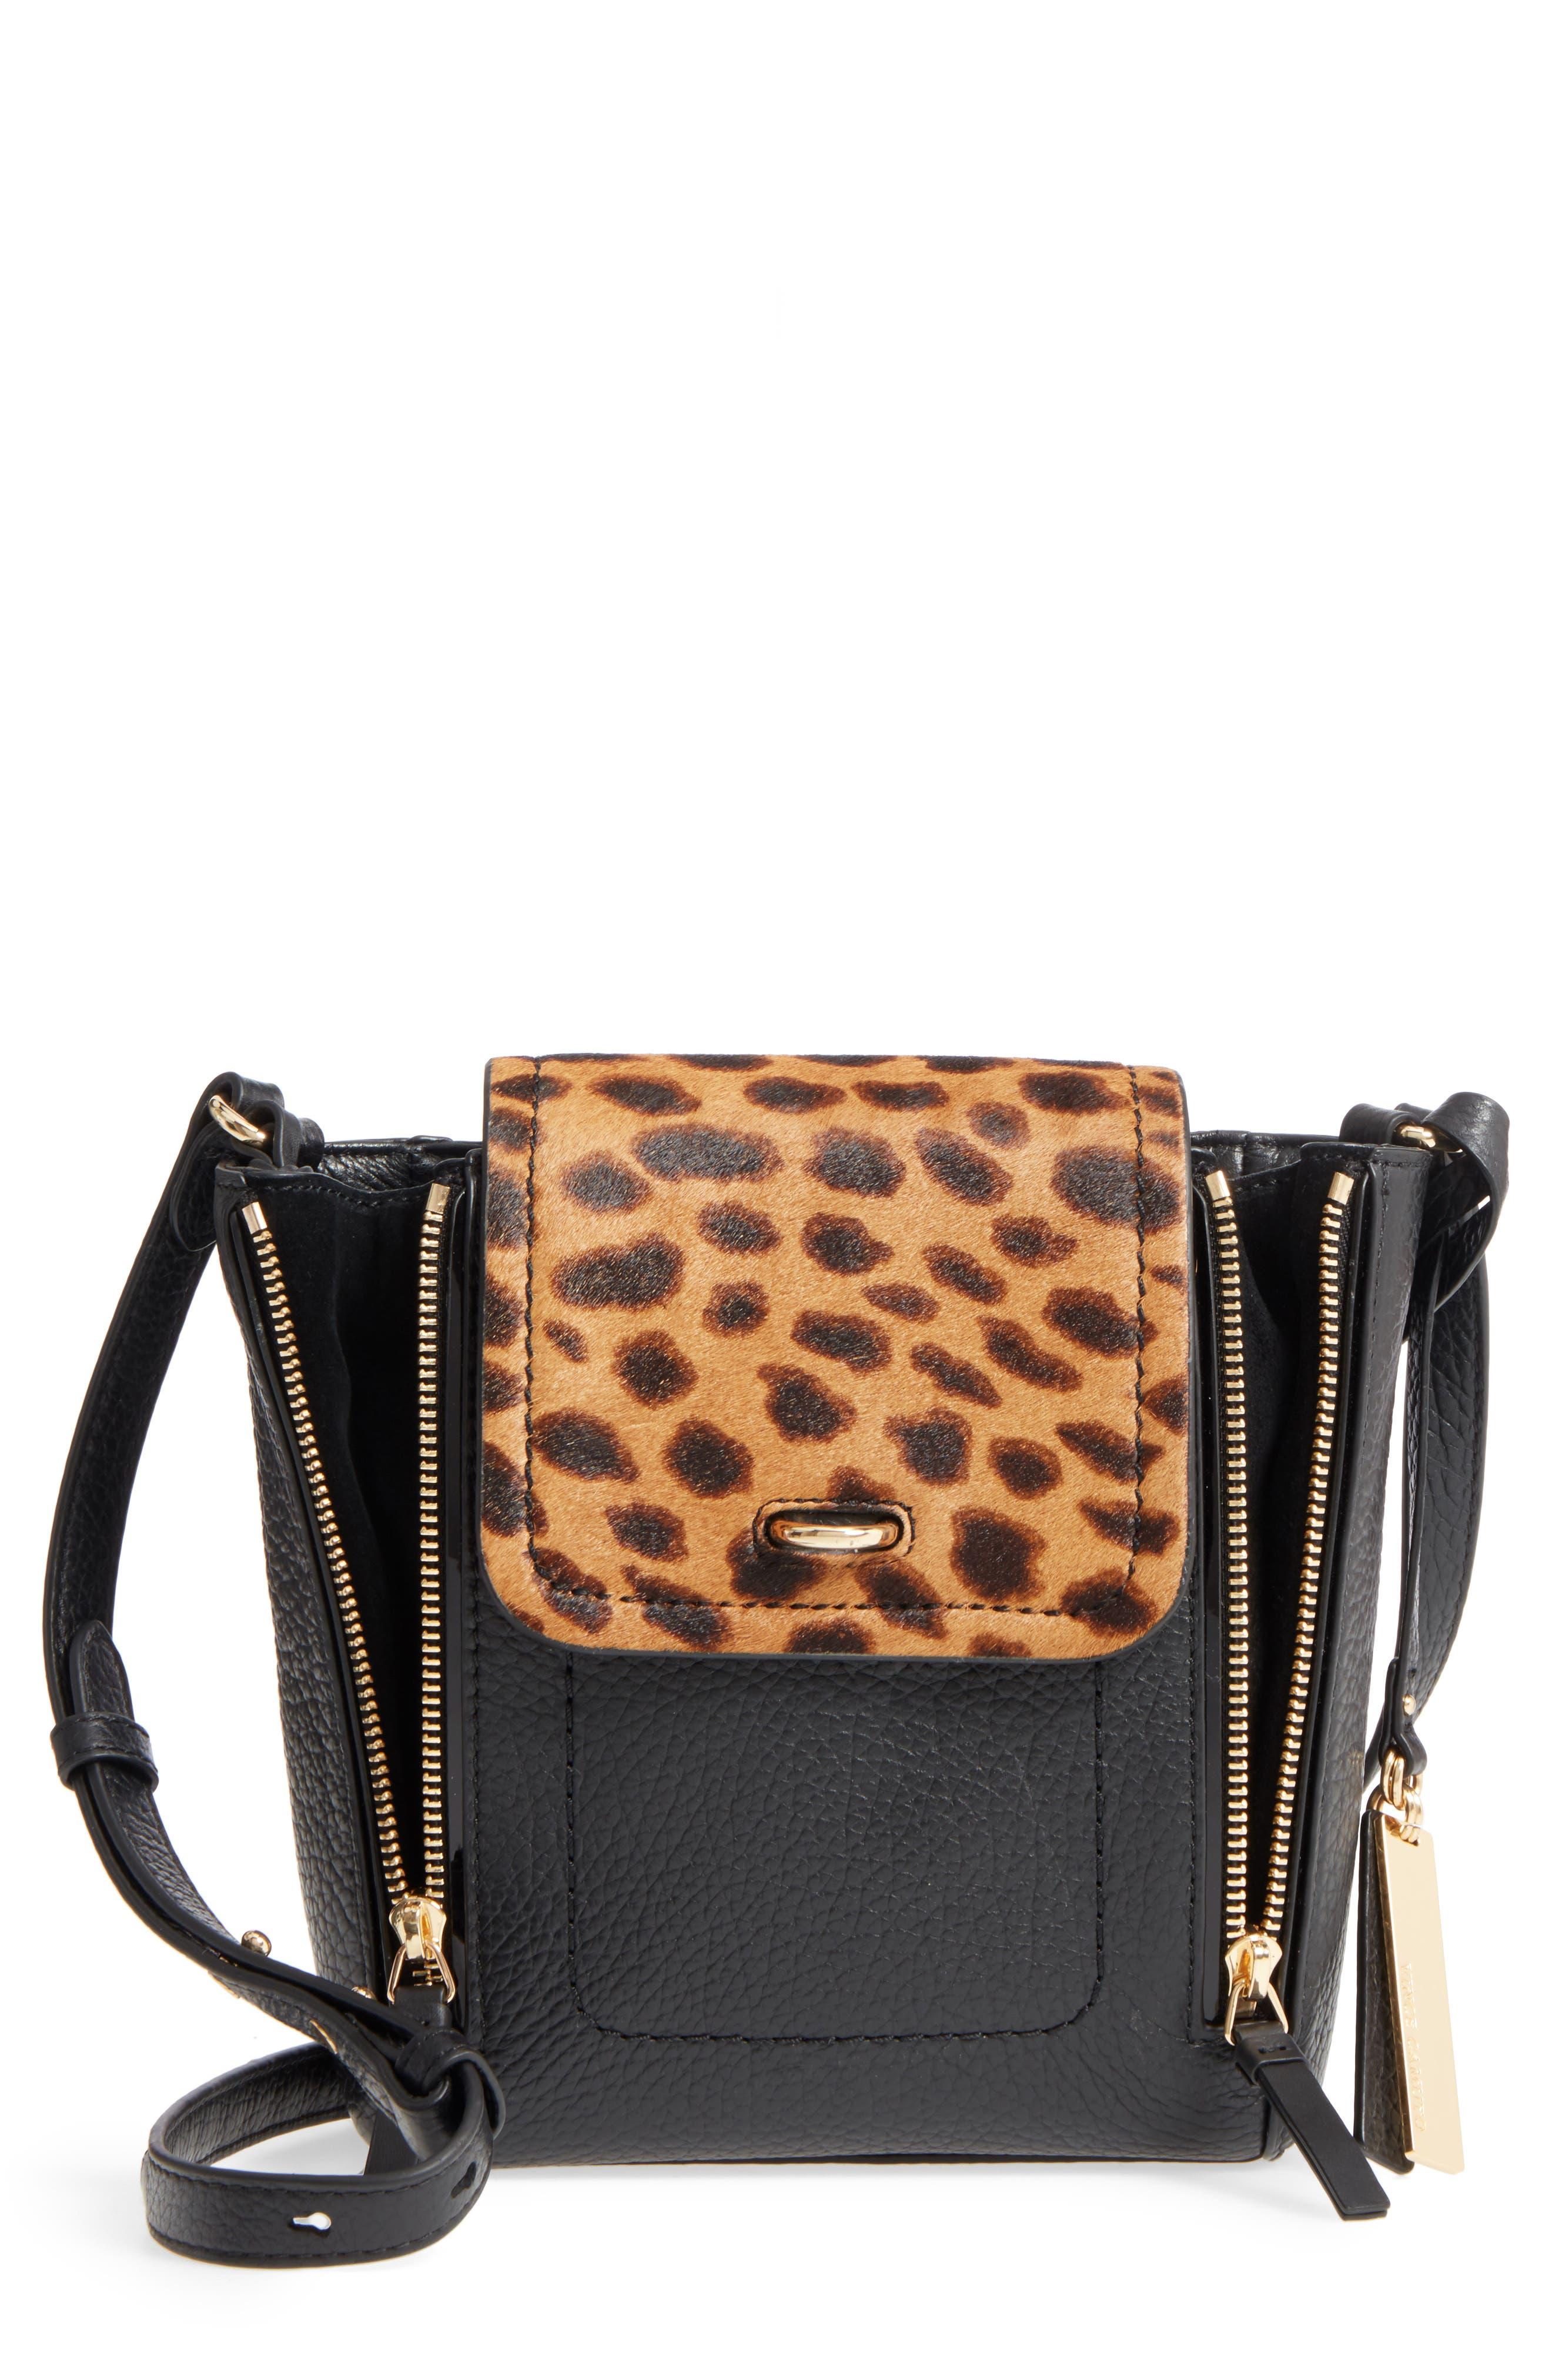 Vince Camuto Blena Genuine Calf Hair & Leather Crossbody Bag